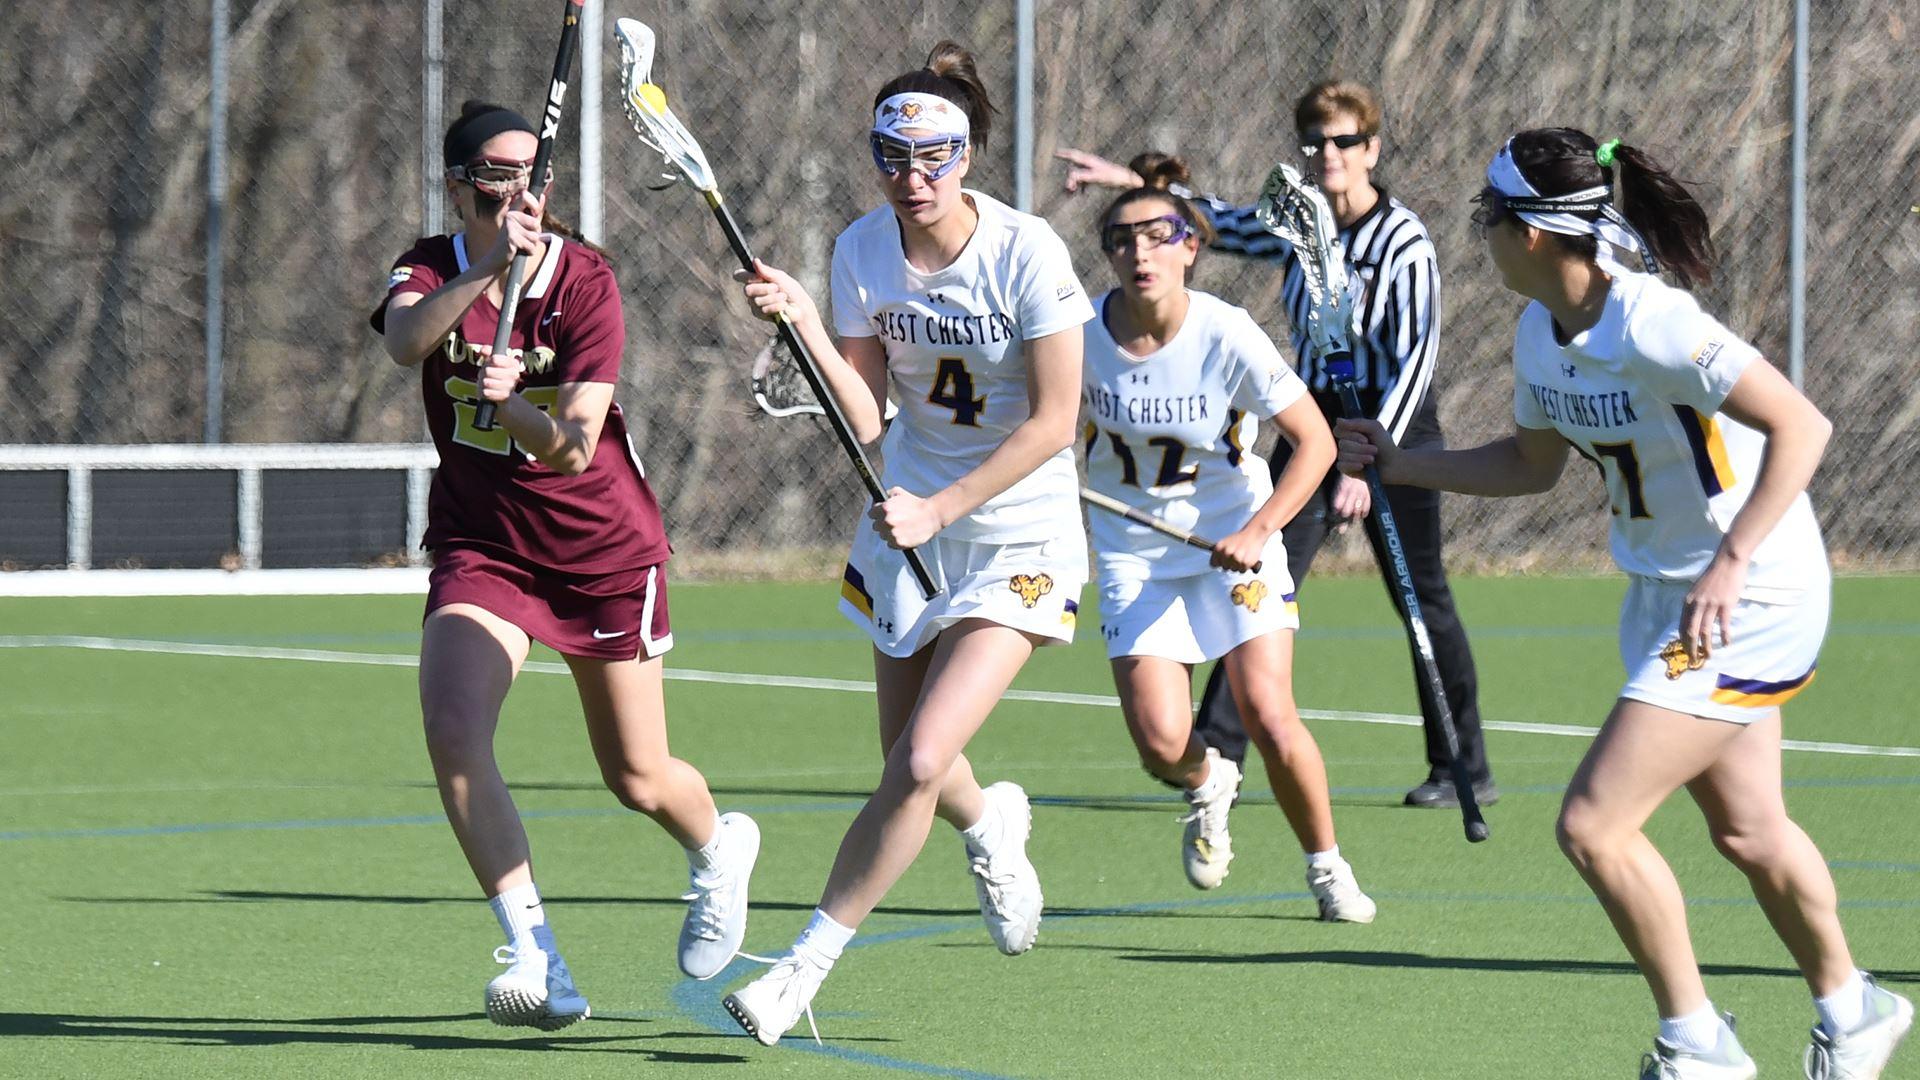 di womens college lacrosse home ncaacom - HD1920×1080